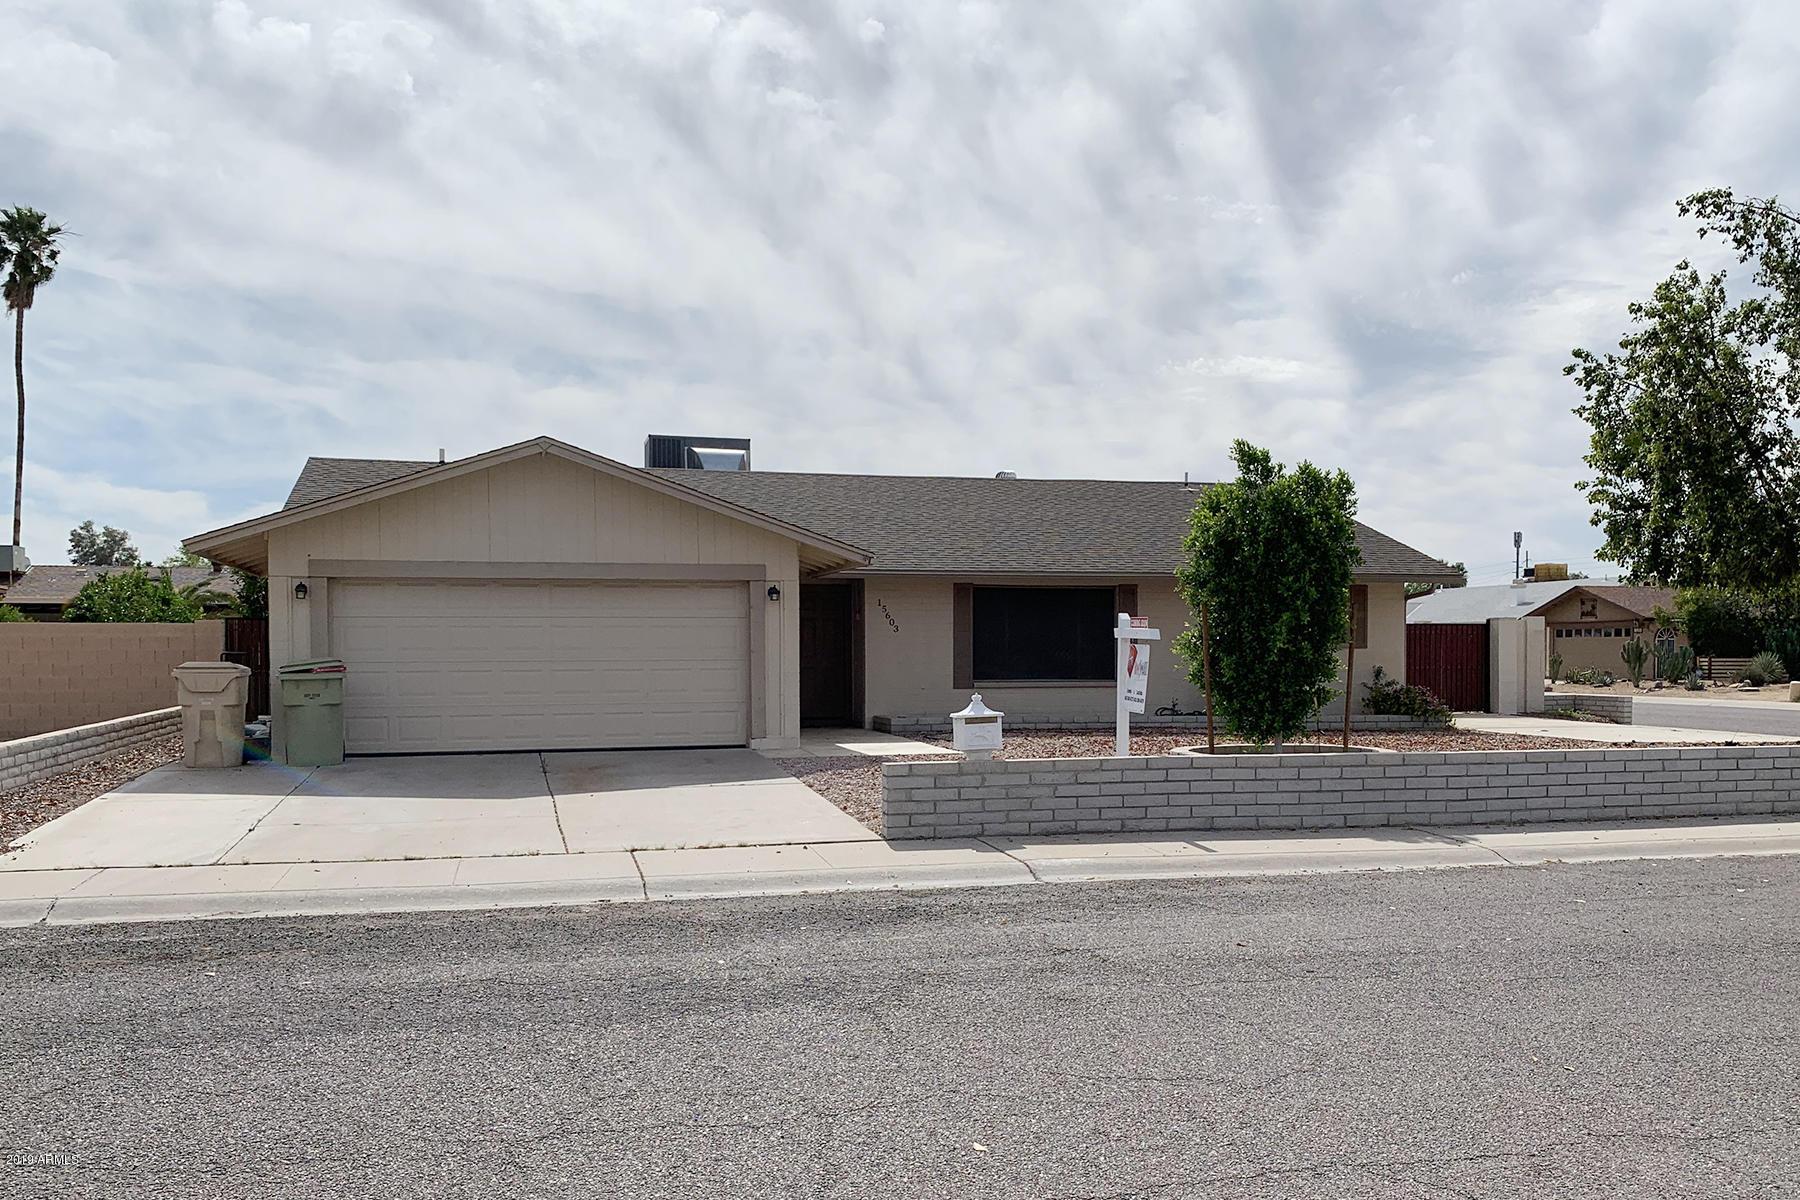 Photo of 15603 N 57 Avenue, Glendale, AZ 85306